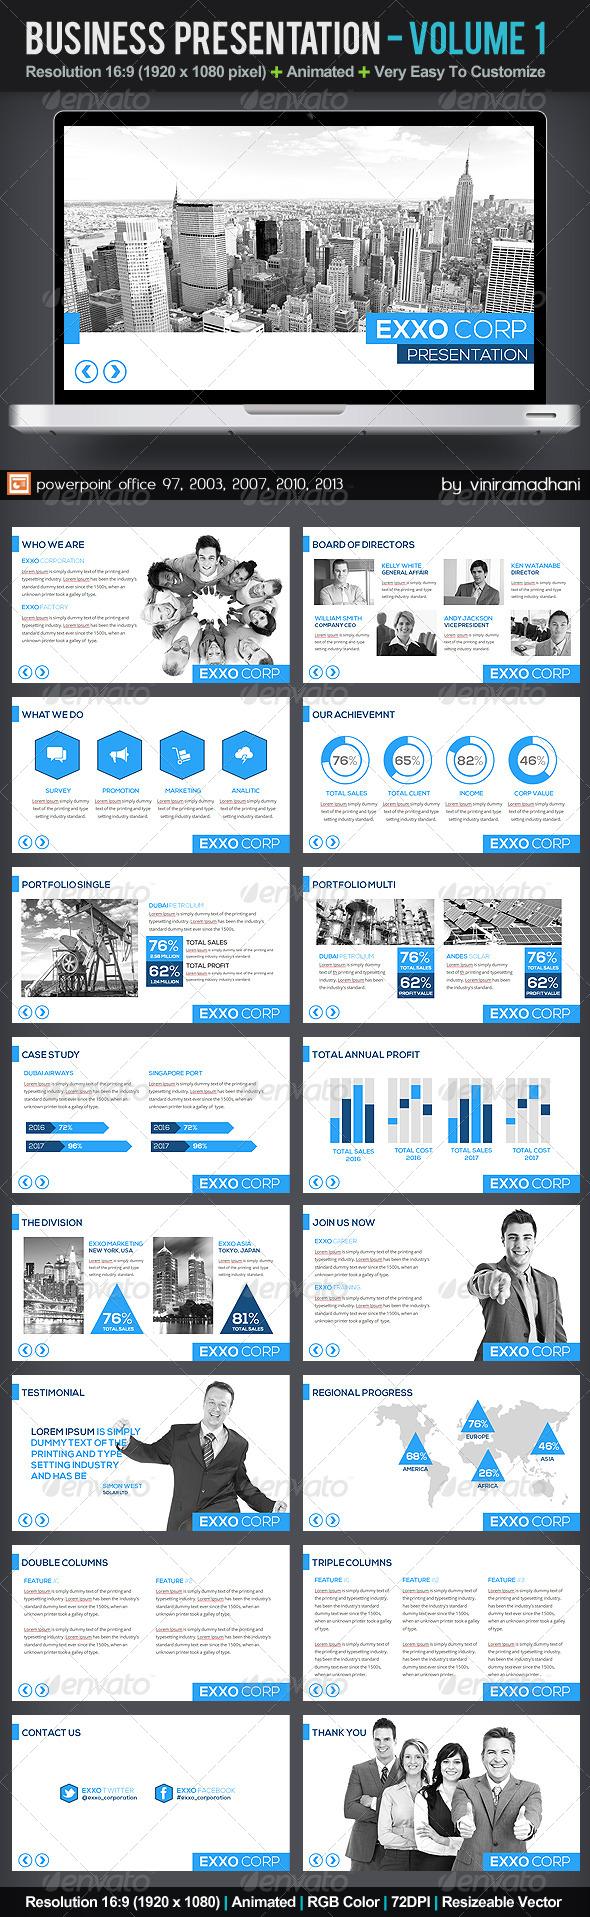 GraphicRiver Business Presentation Volume 1 5817202